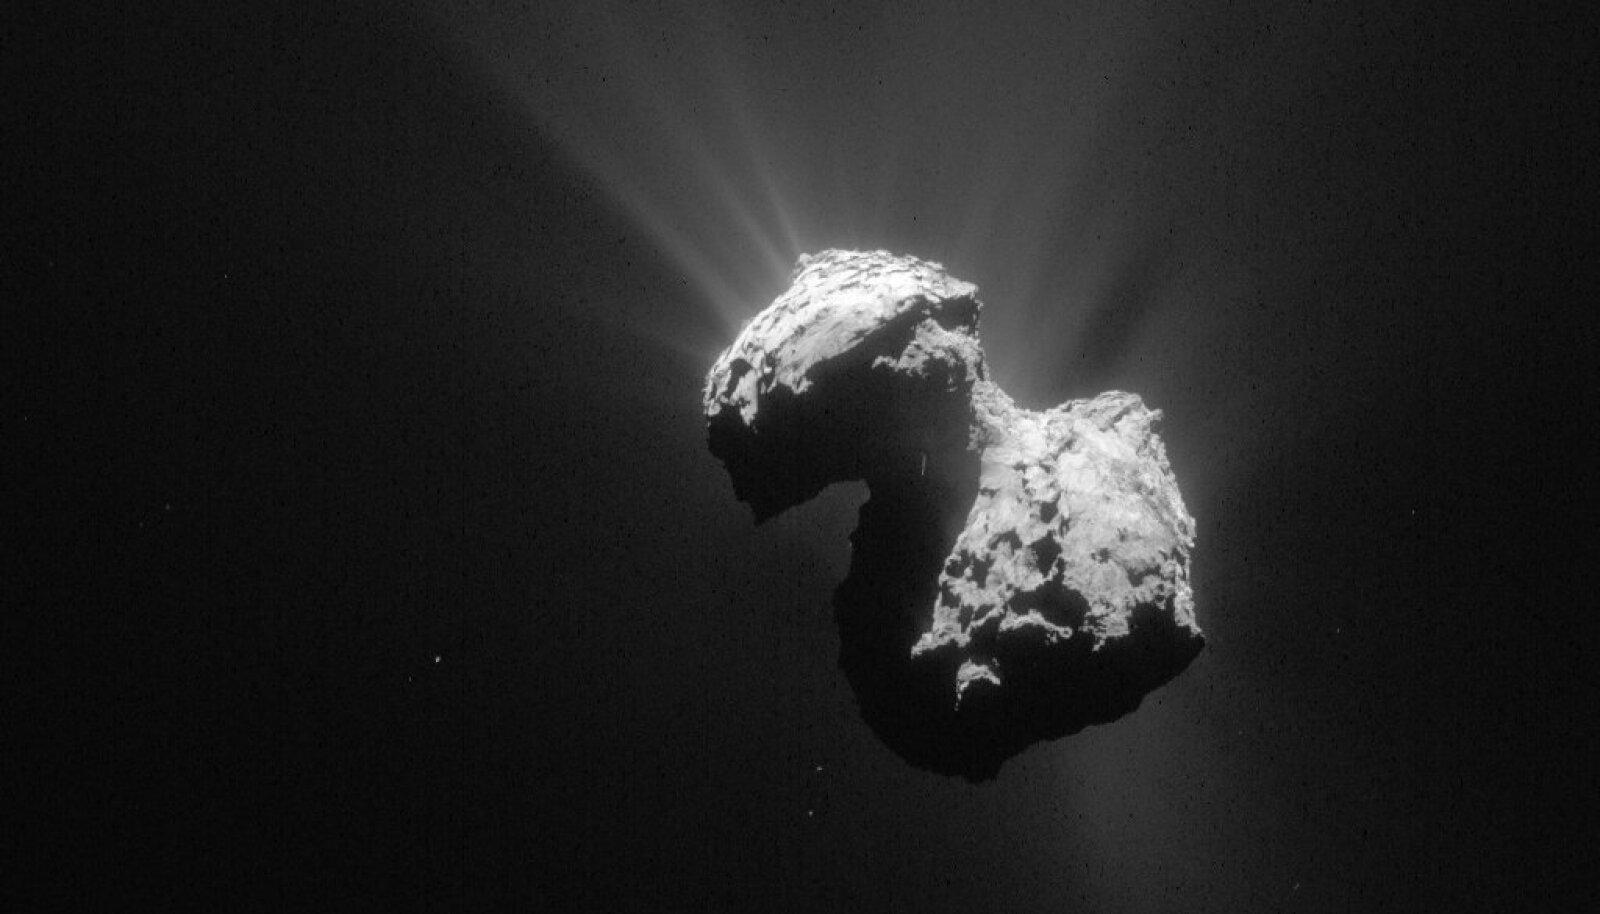 (Foto: Wikimedia Commons / ESA, Rosetta, NAVCAM)